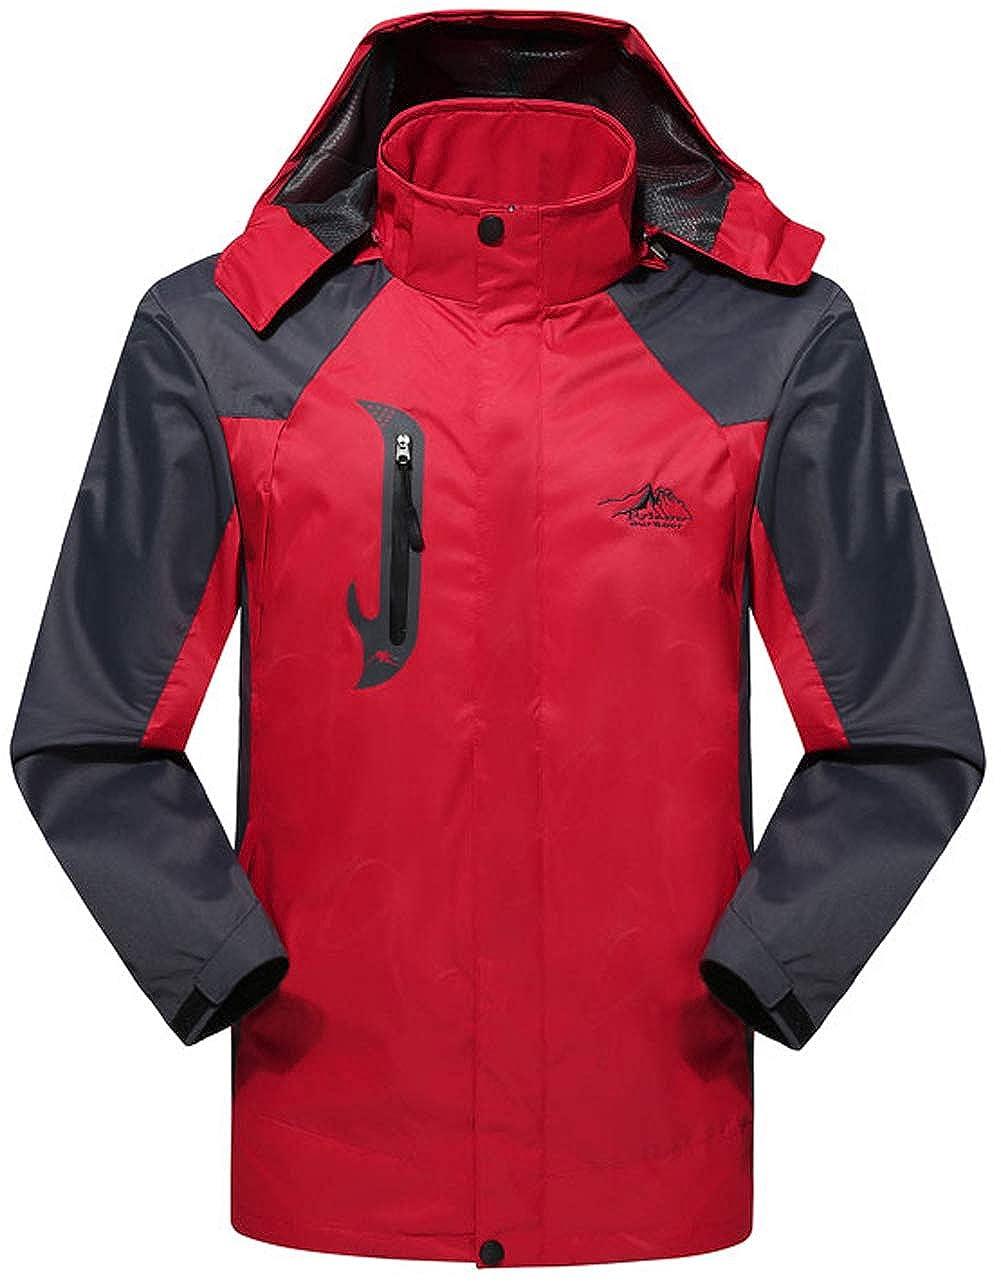 FAFNIR Men Lightweight Jackets Waterproof Jacket Coats with Hooded